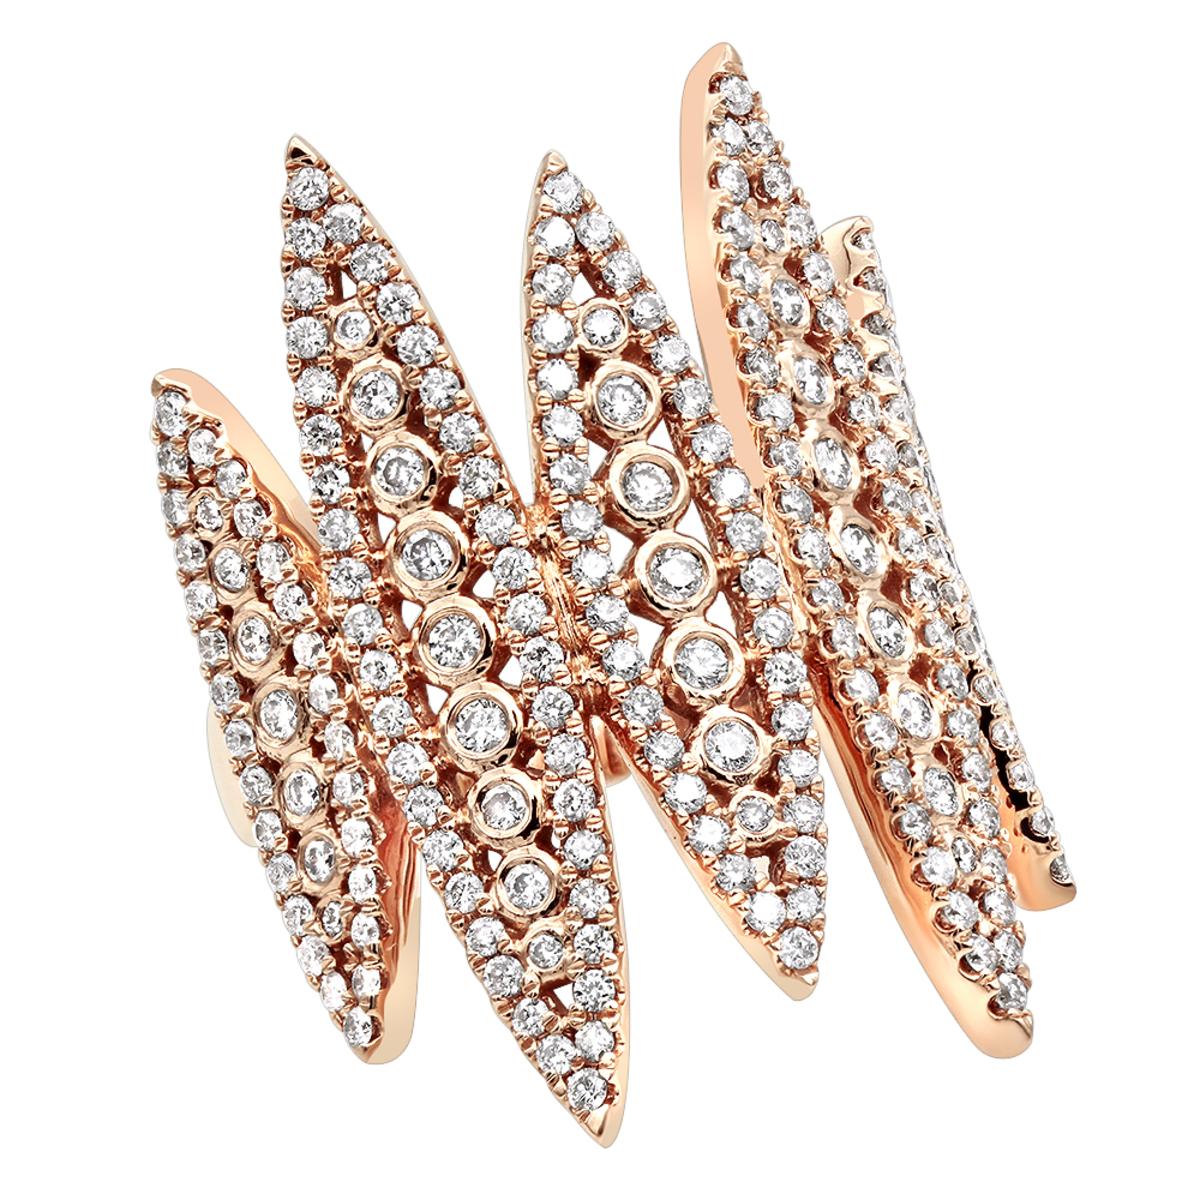 Unique 14k Gold Designer Diamond Fashion Ring for Women 1.25ct By Luxurman